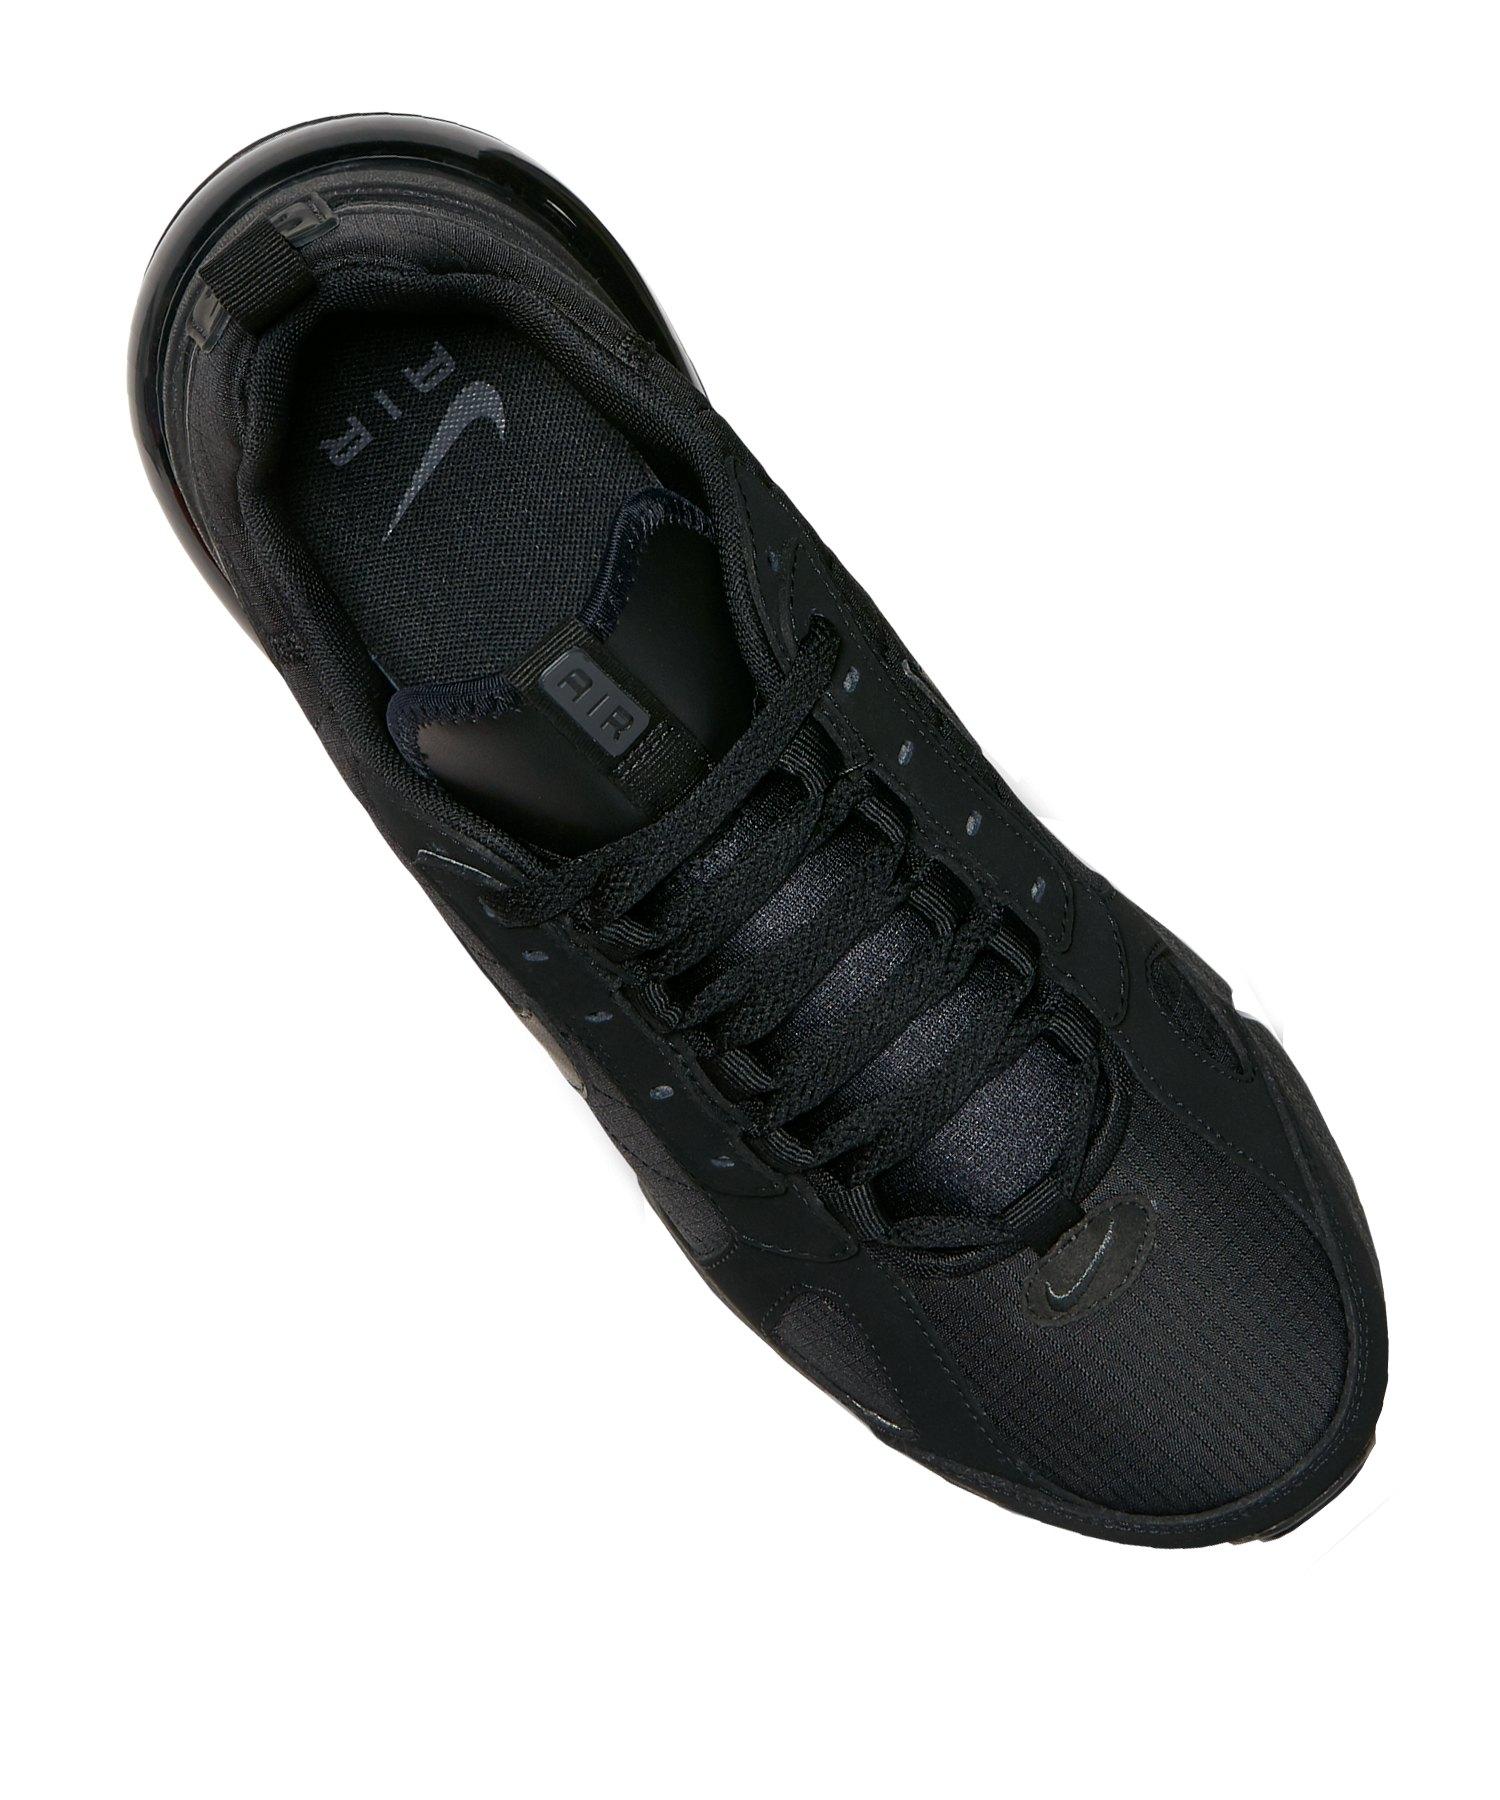 Details zu Nike Air Max 270 Futura Sneaker Schuhe Herren